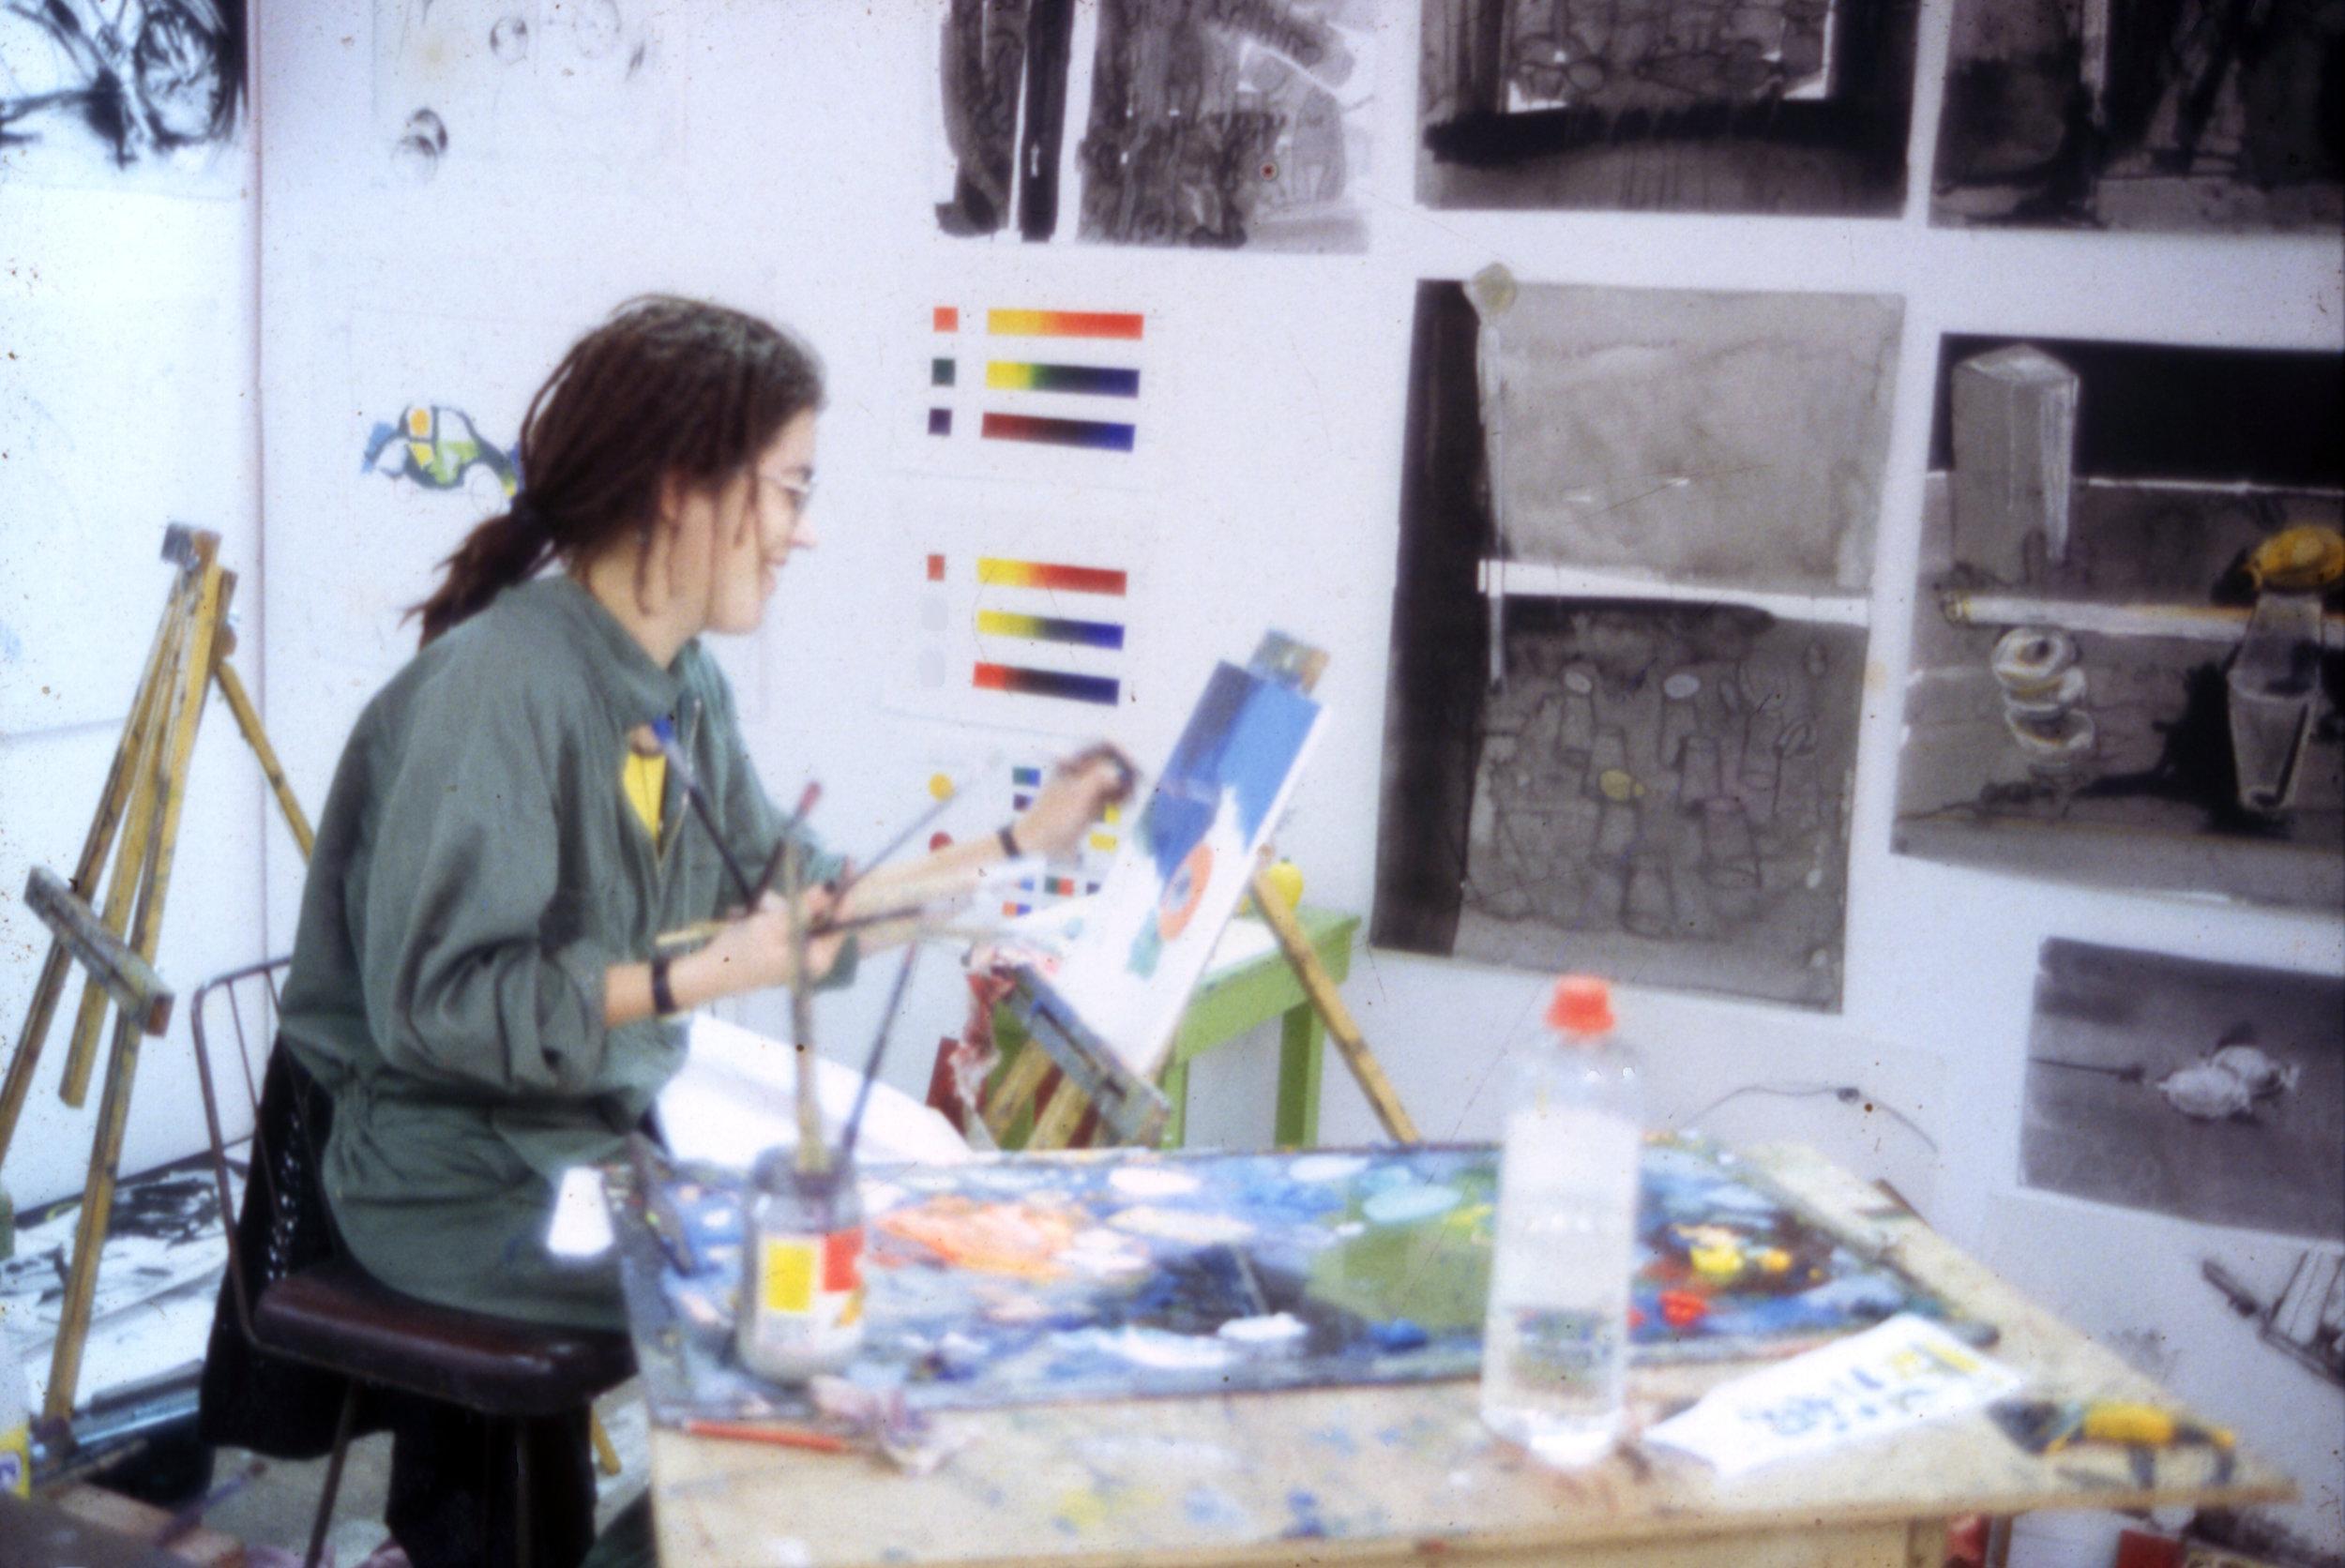 Art School kid back in the day...